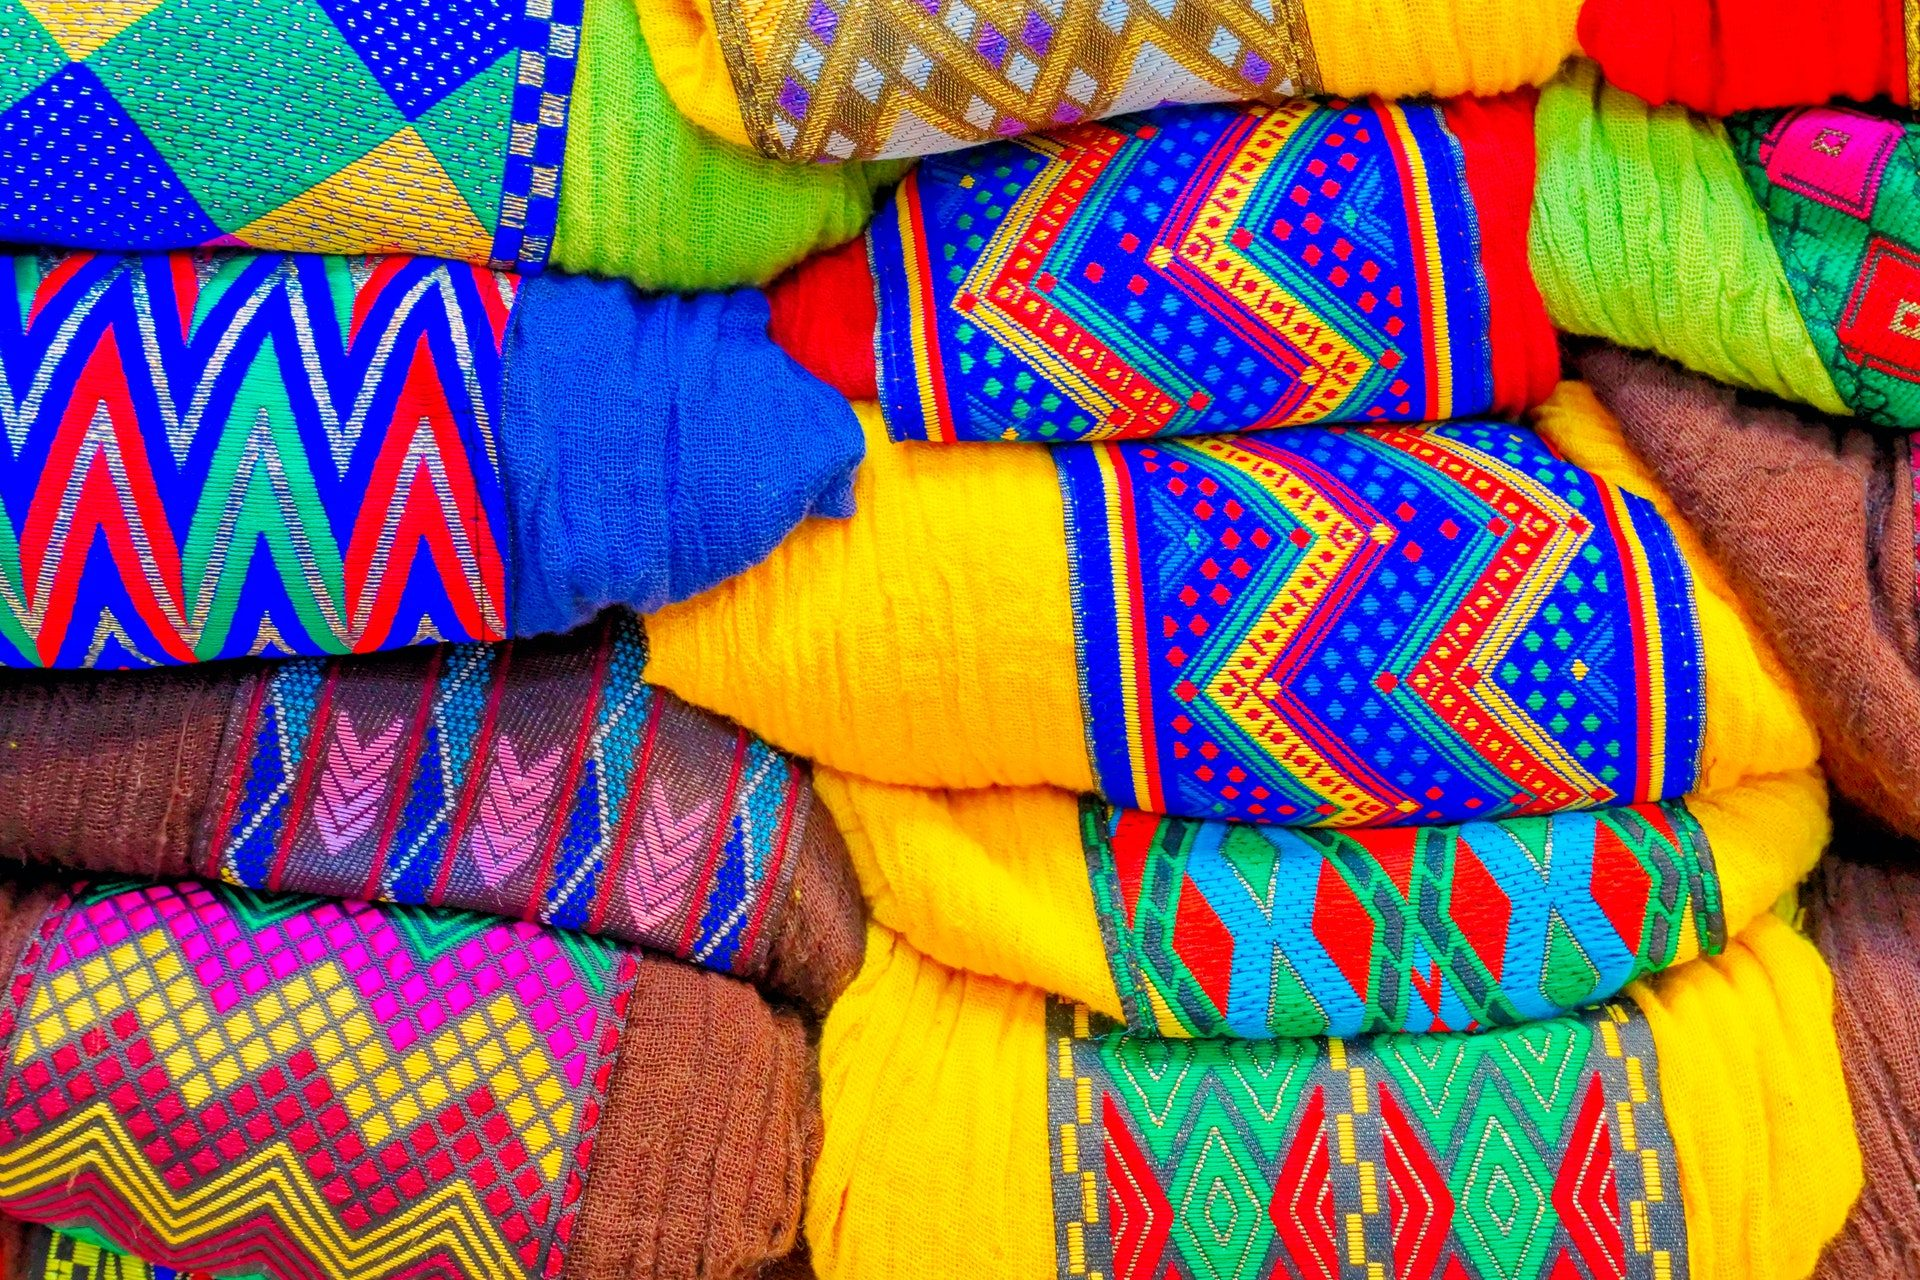 assorted-color-textile-lot-2828584